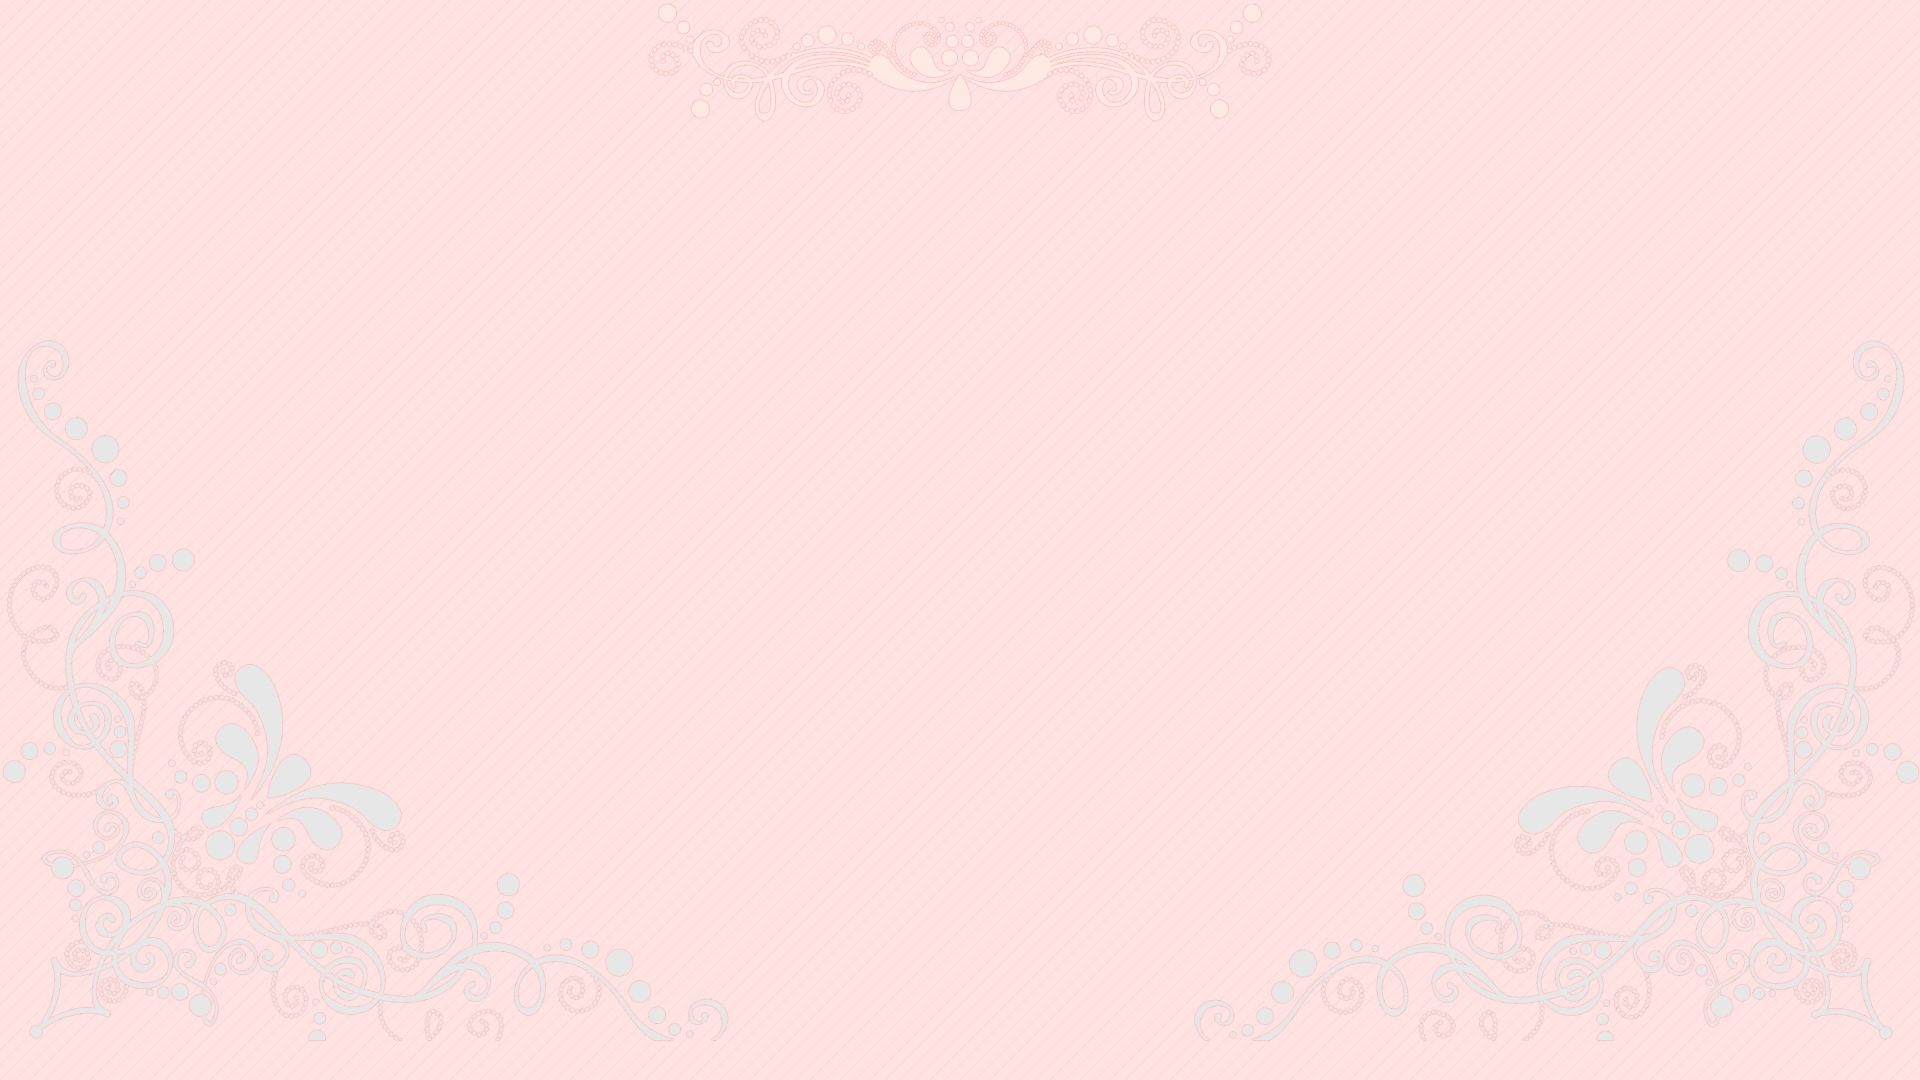 Pasteles Aniversarios Pictures To Pin On Pinterest: HD Desktop Background Pastel